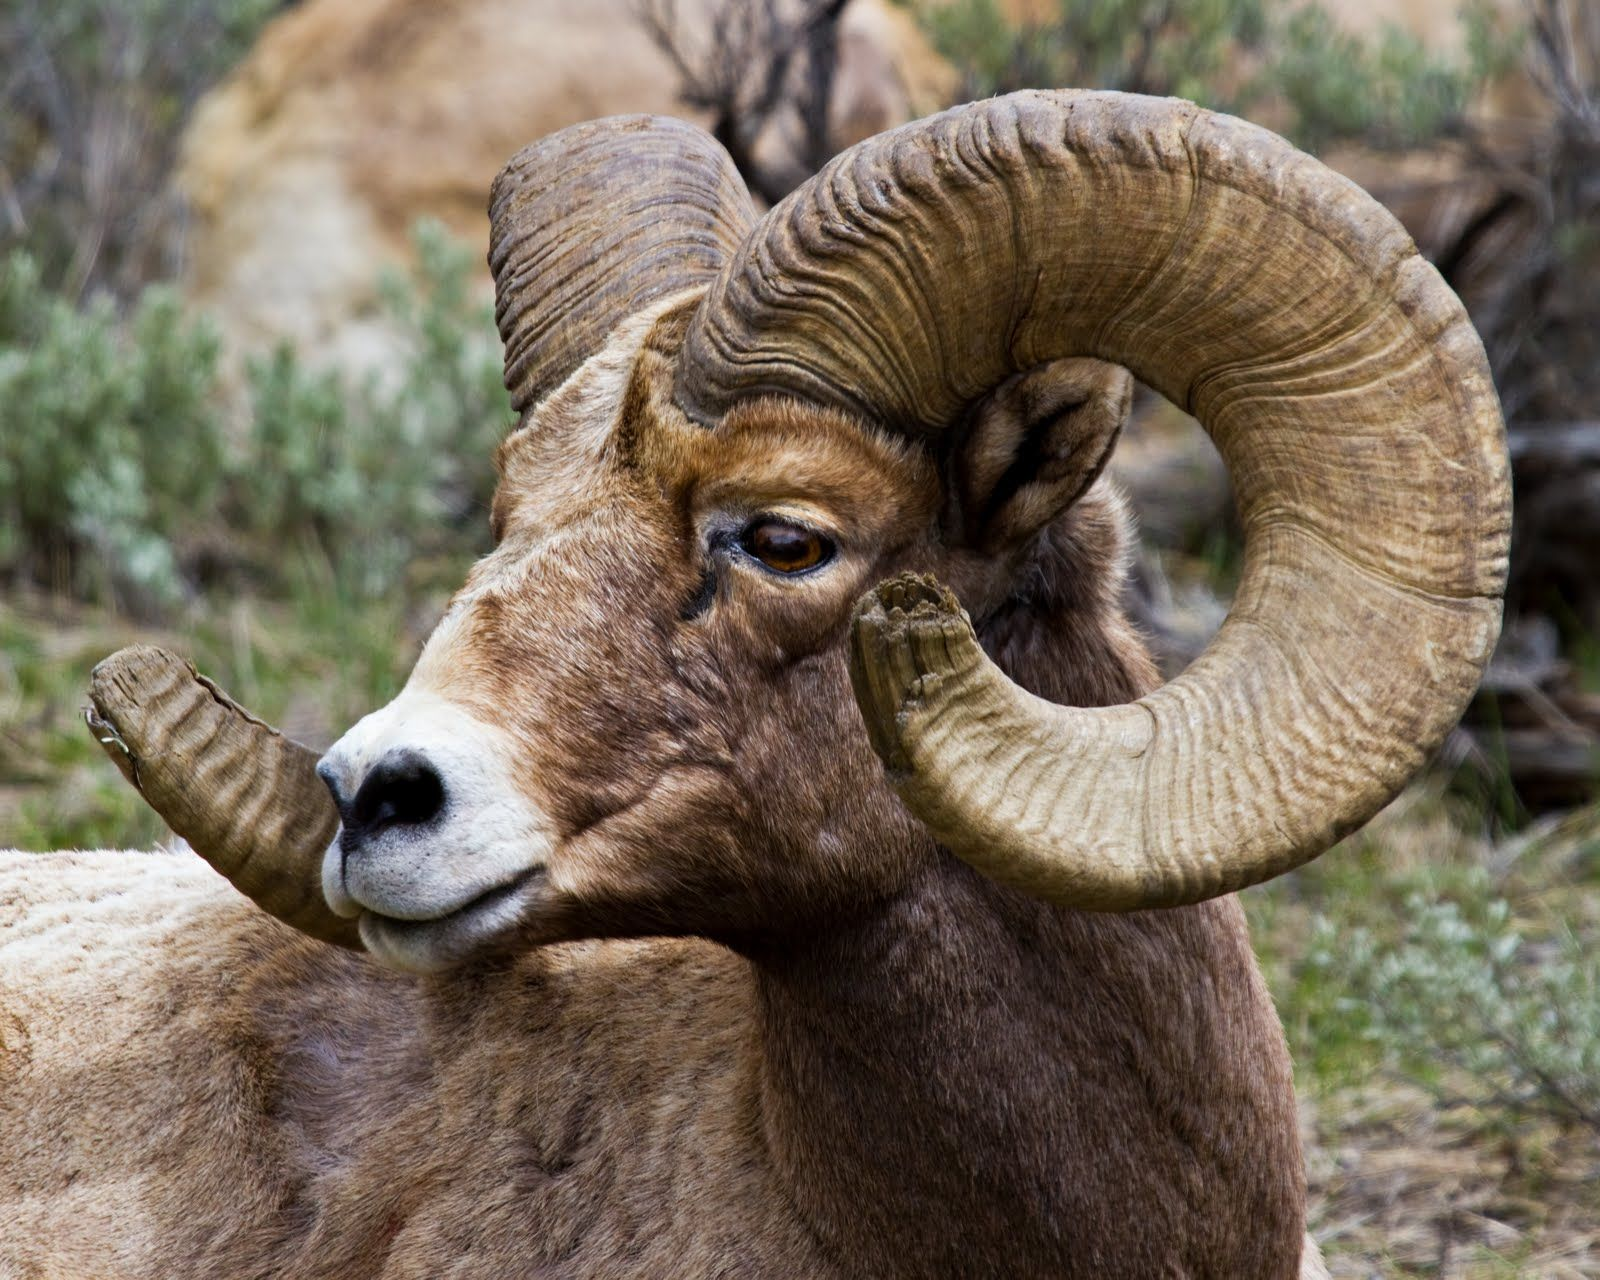 goat skulls with eyes - Google Search | animal anatomy | Pinterest